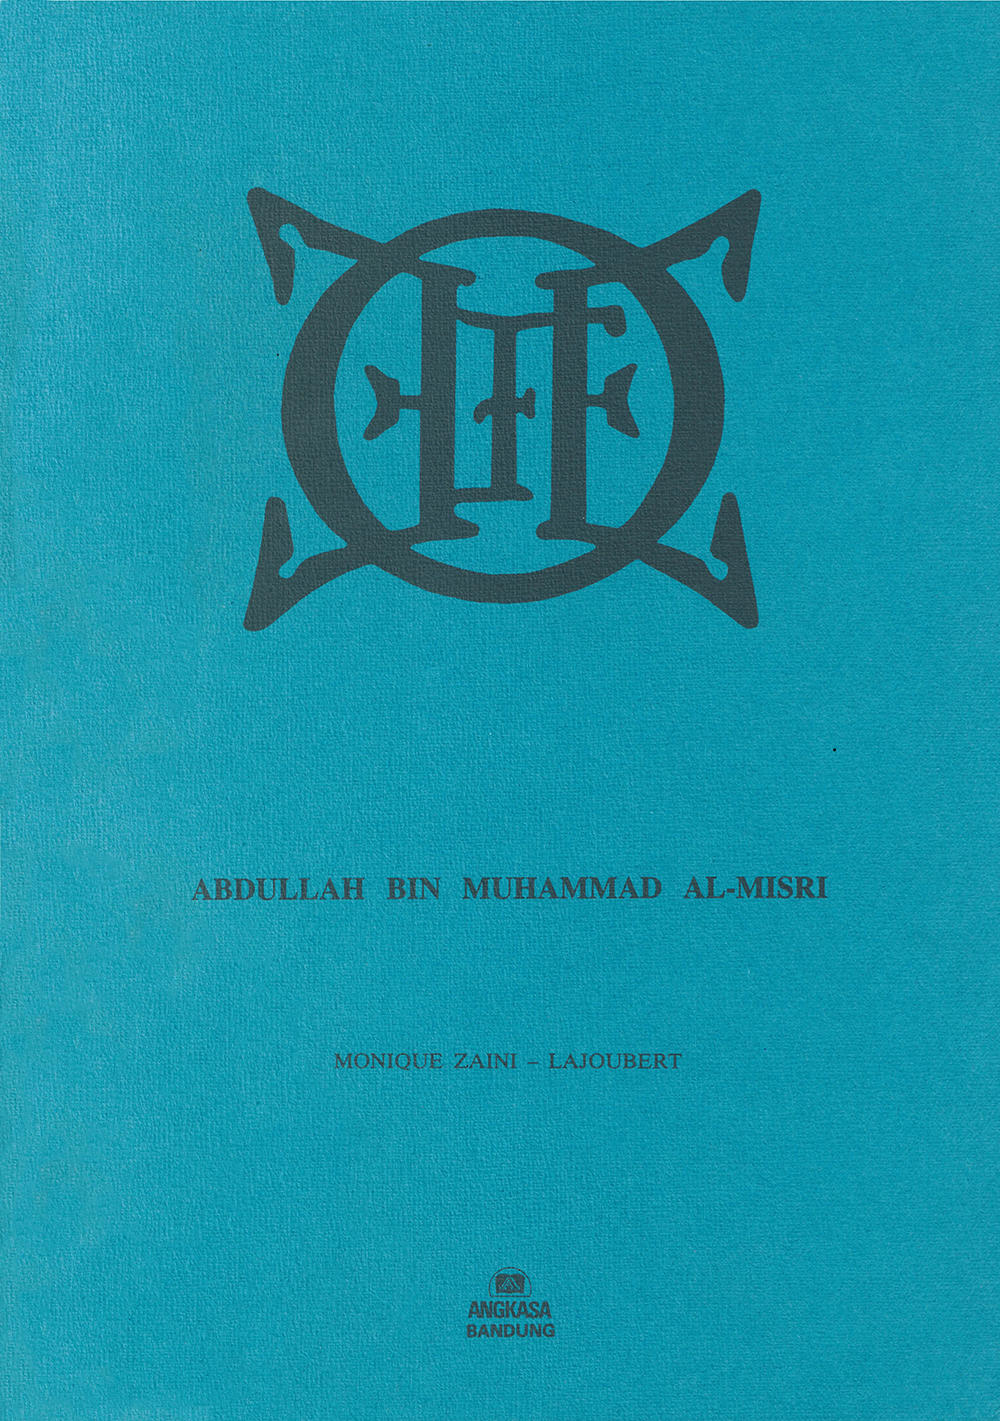 Abdullah bin Muhammad Al-Misri